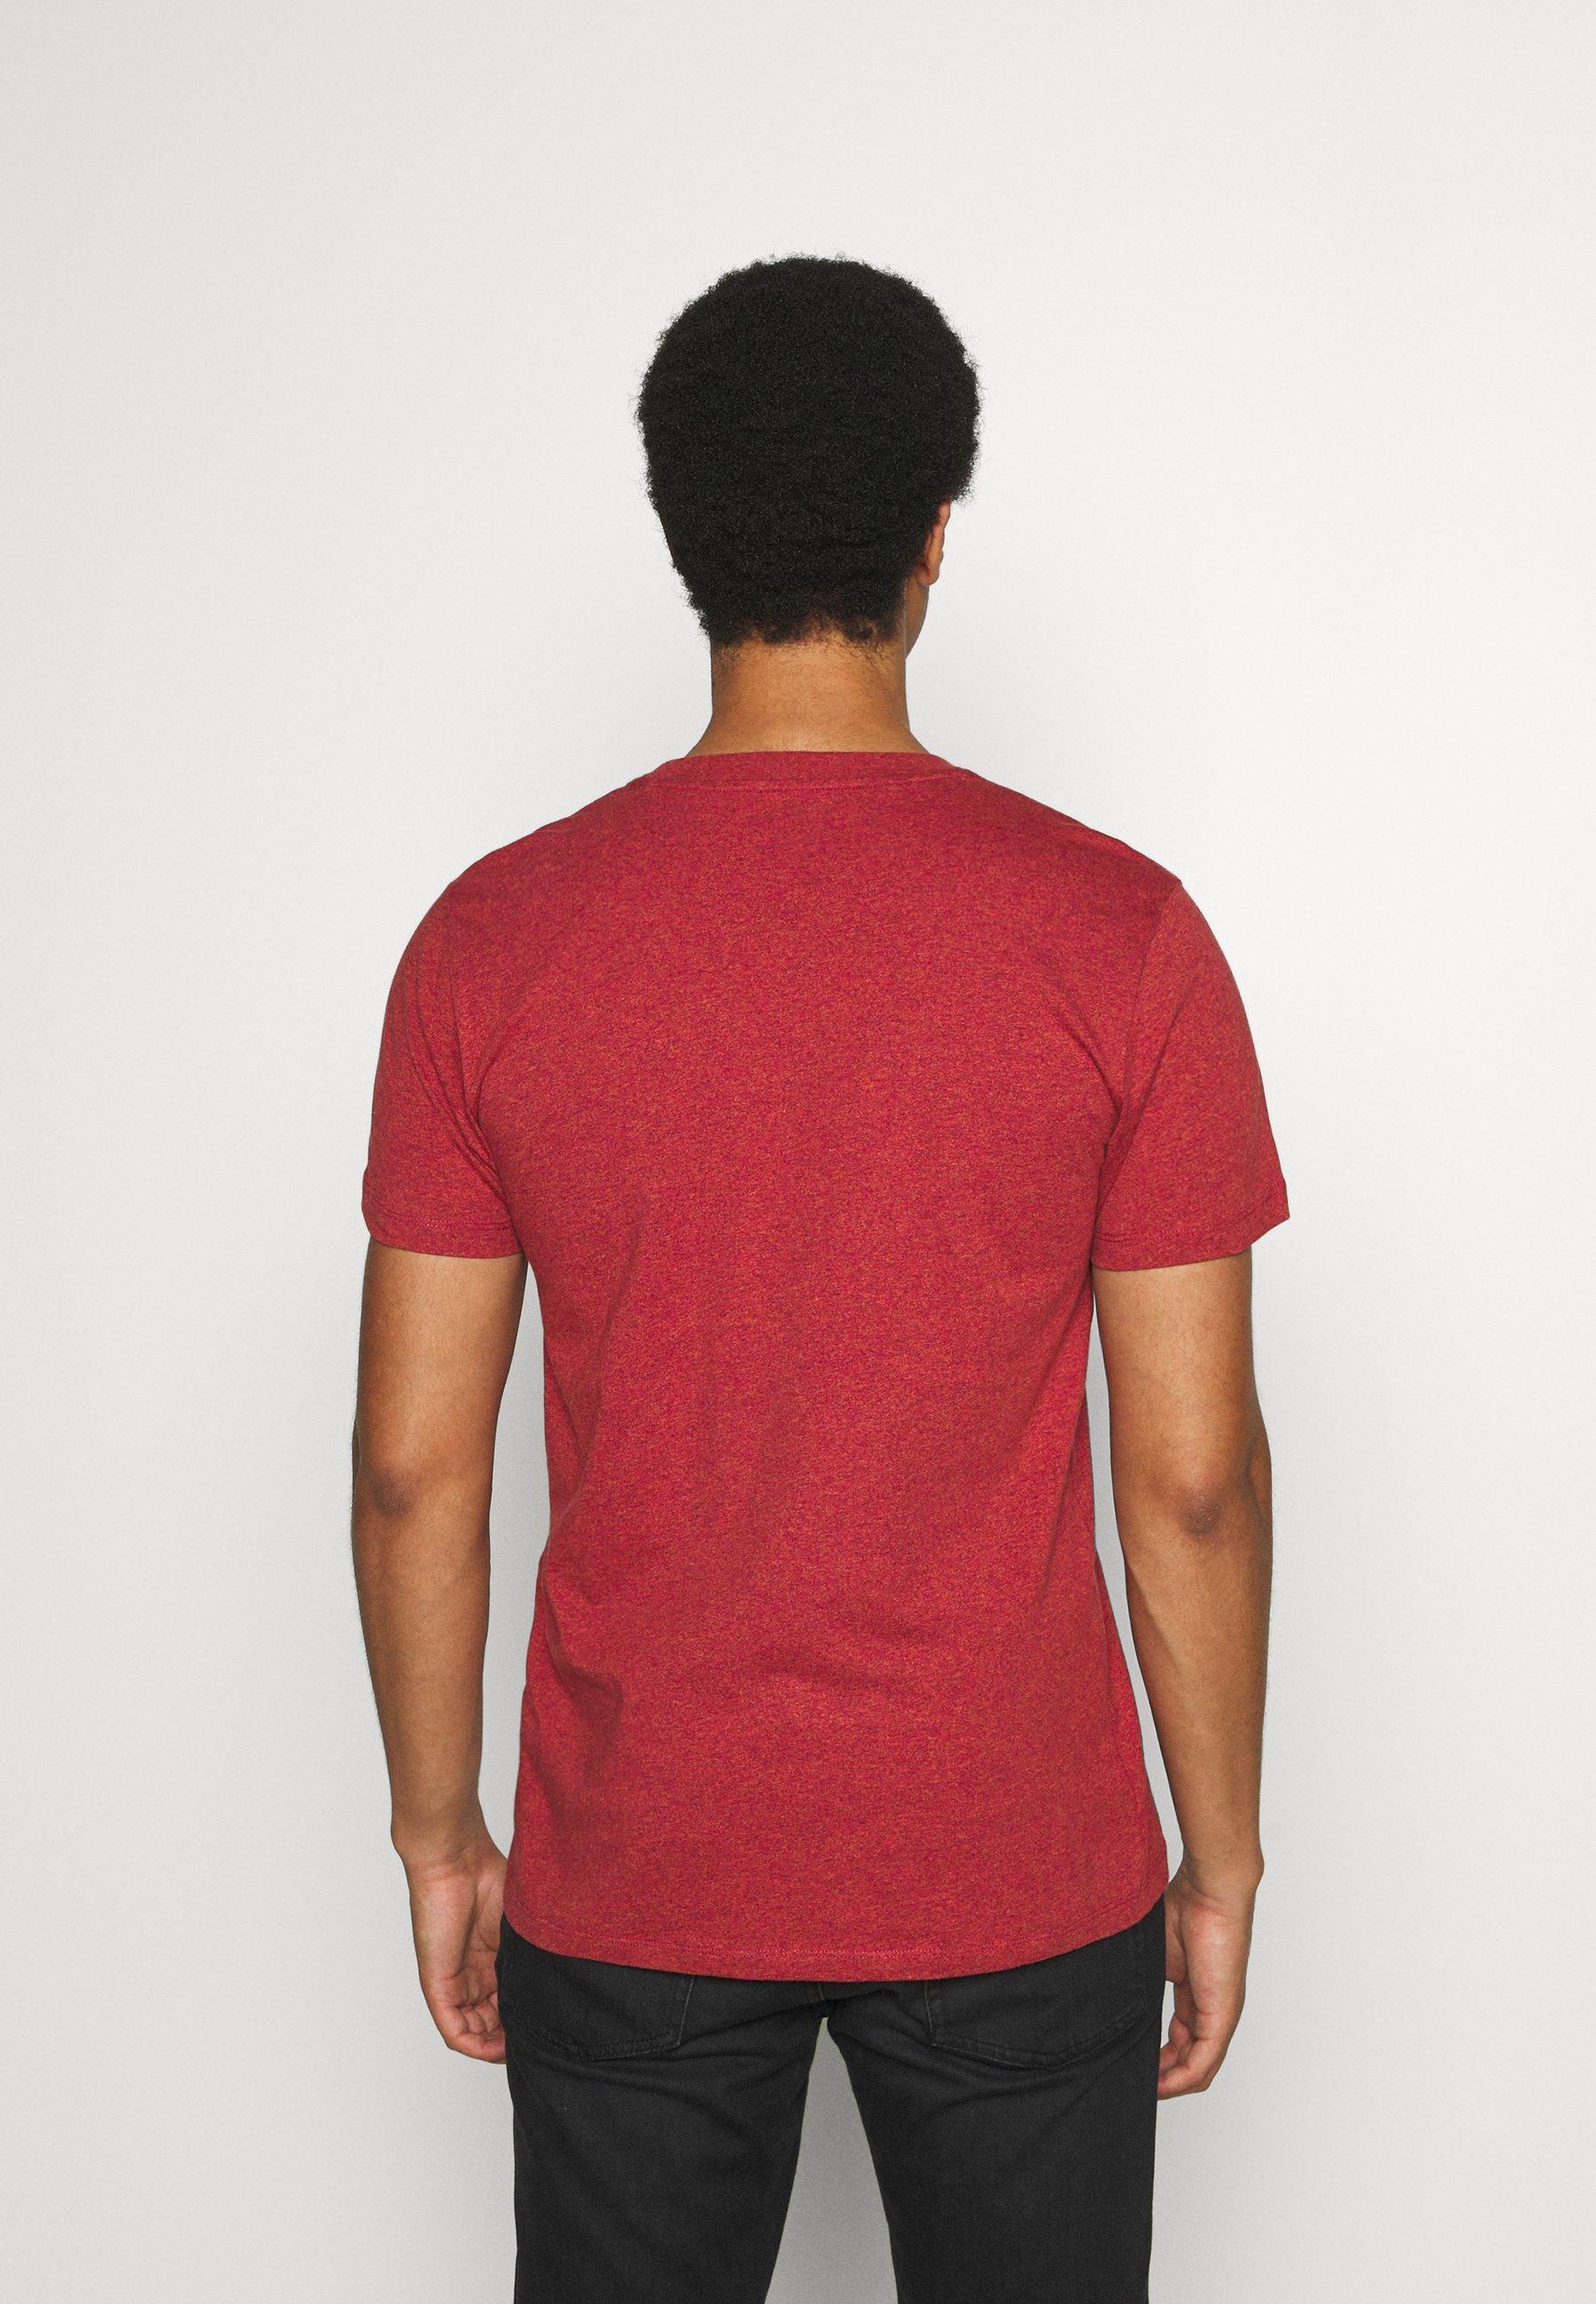 Esprit Basic T-shirt - terracotta Rfyza